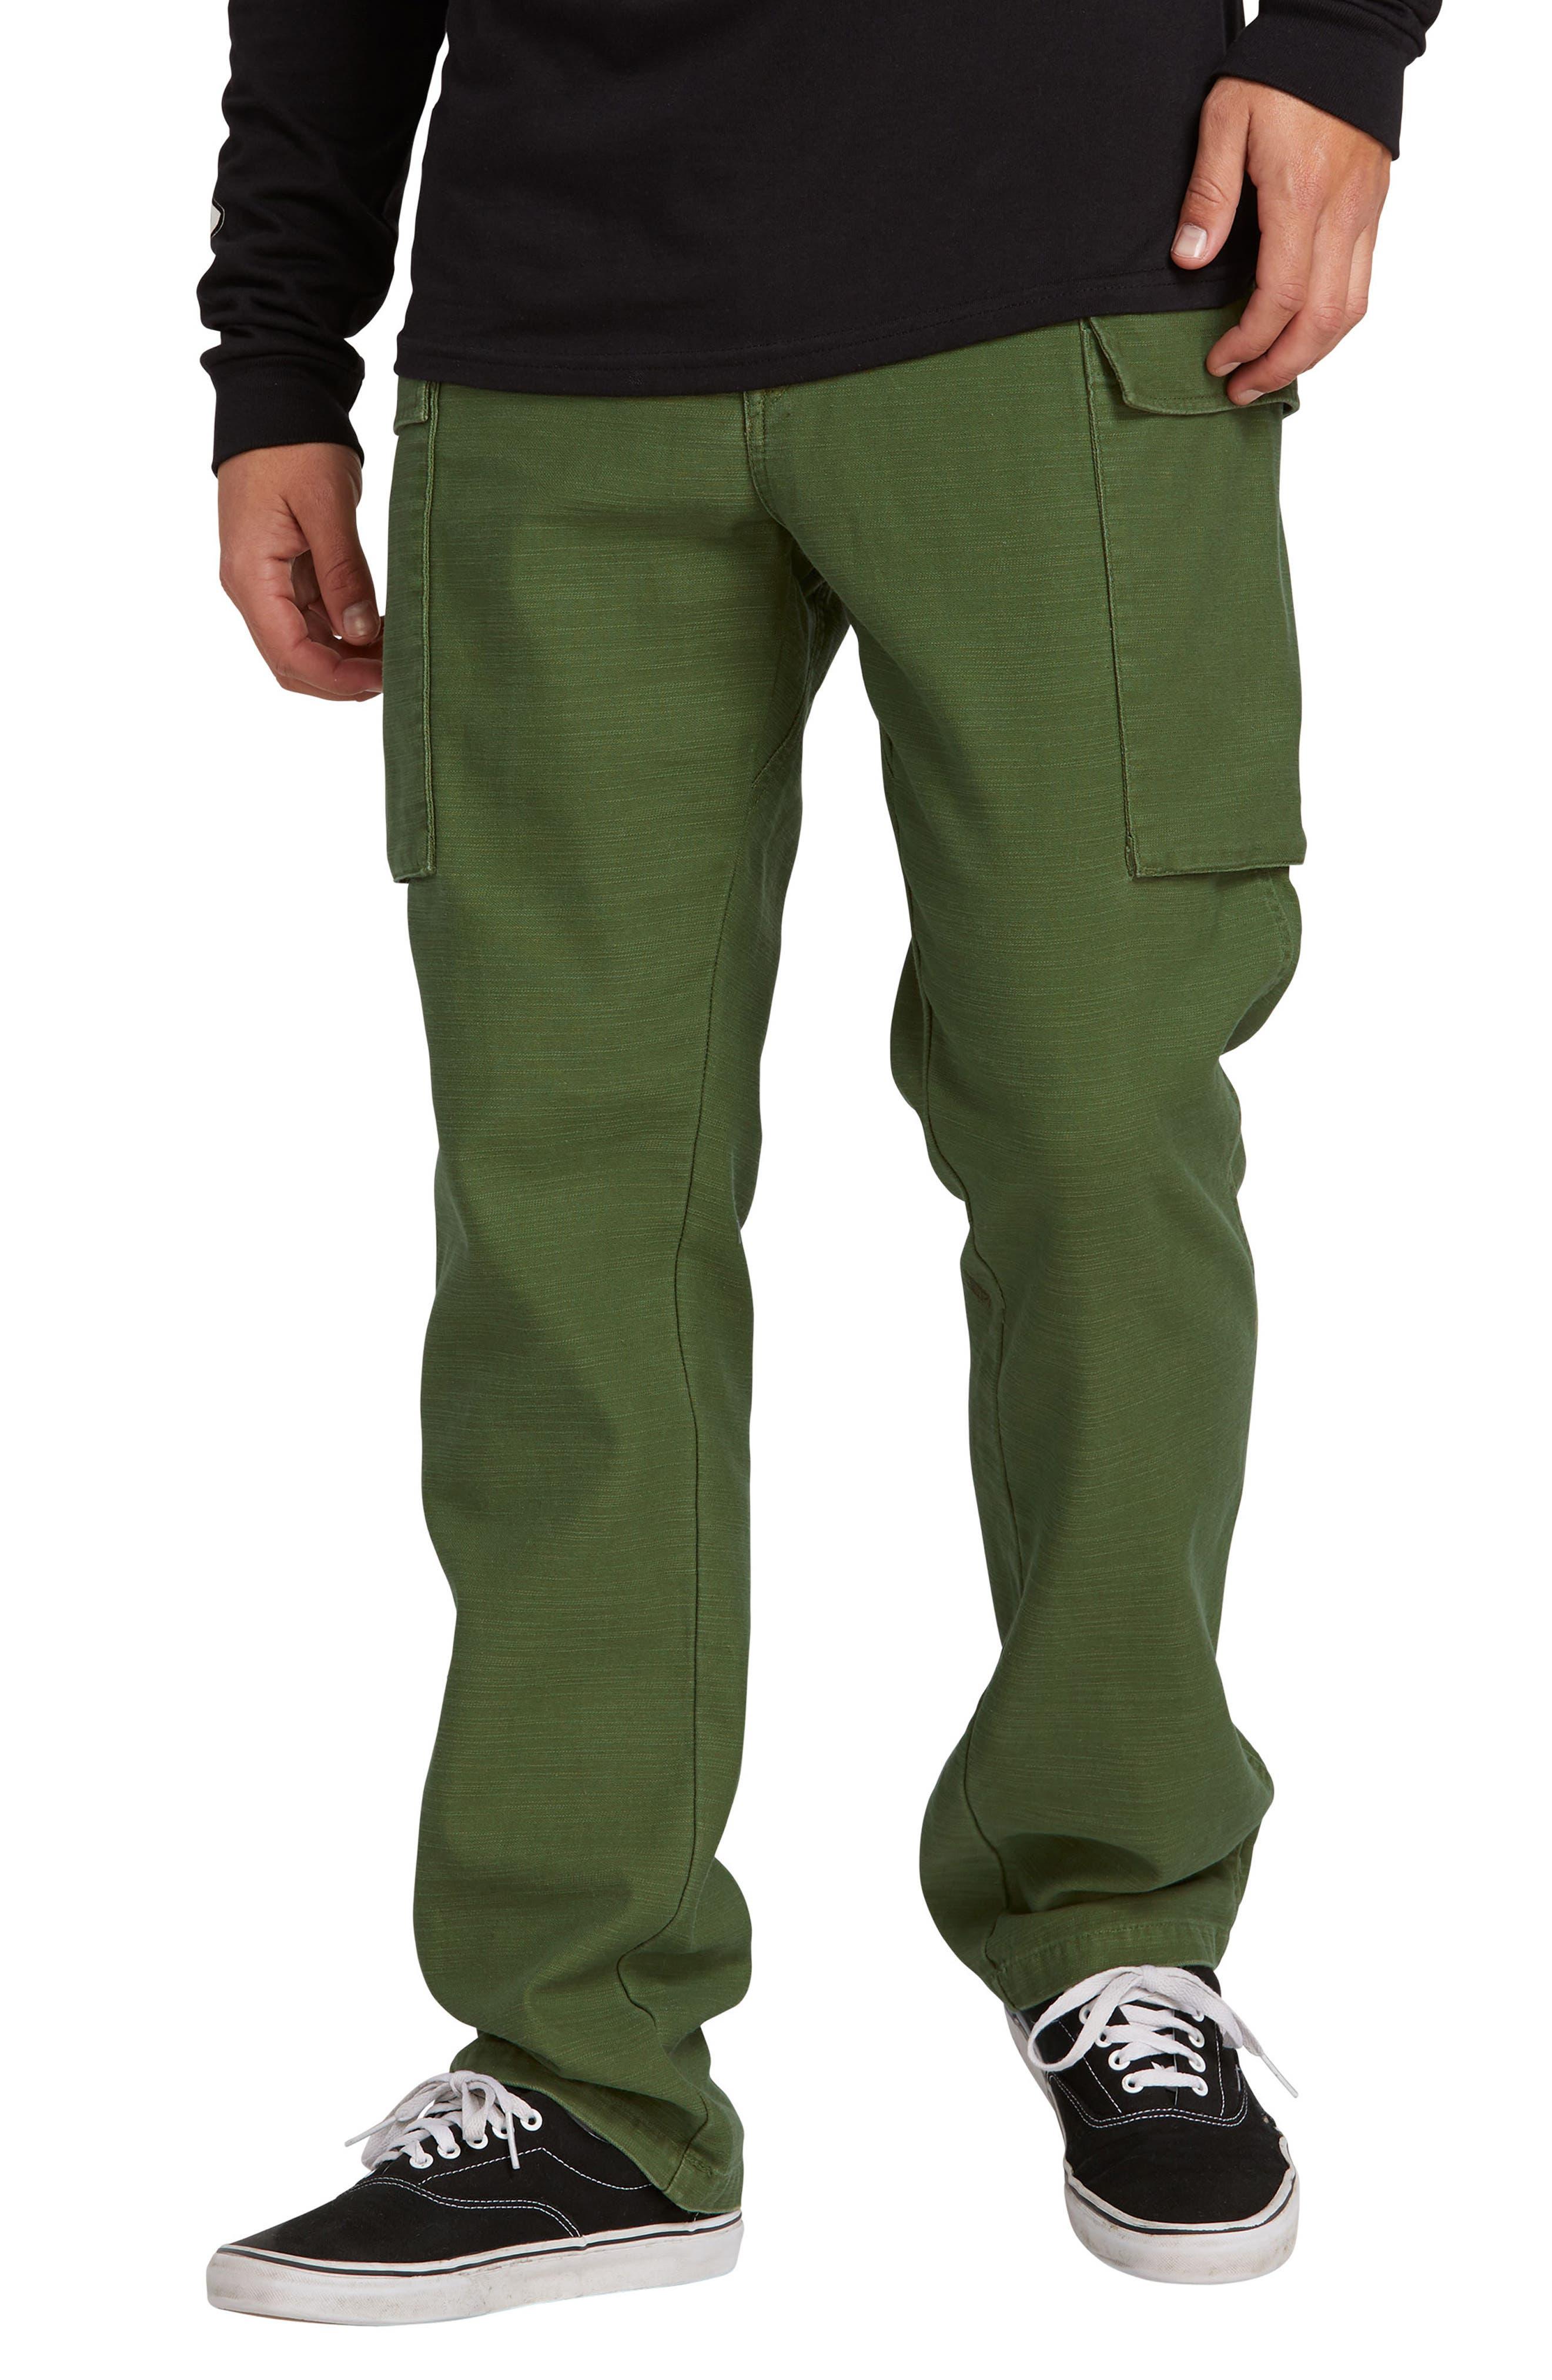 Volcom Gritter Cargo Pants, Green